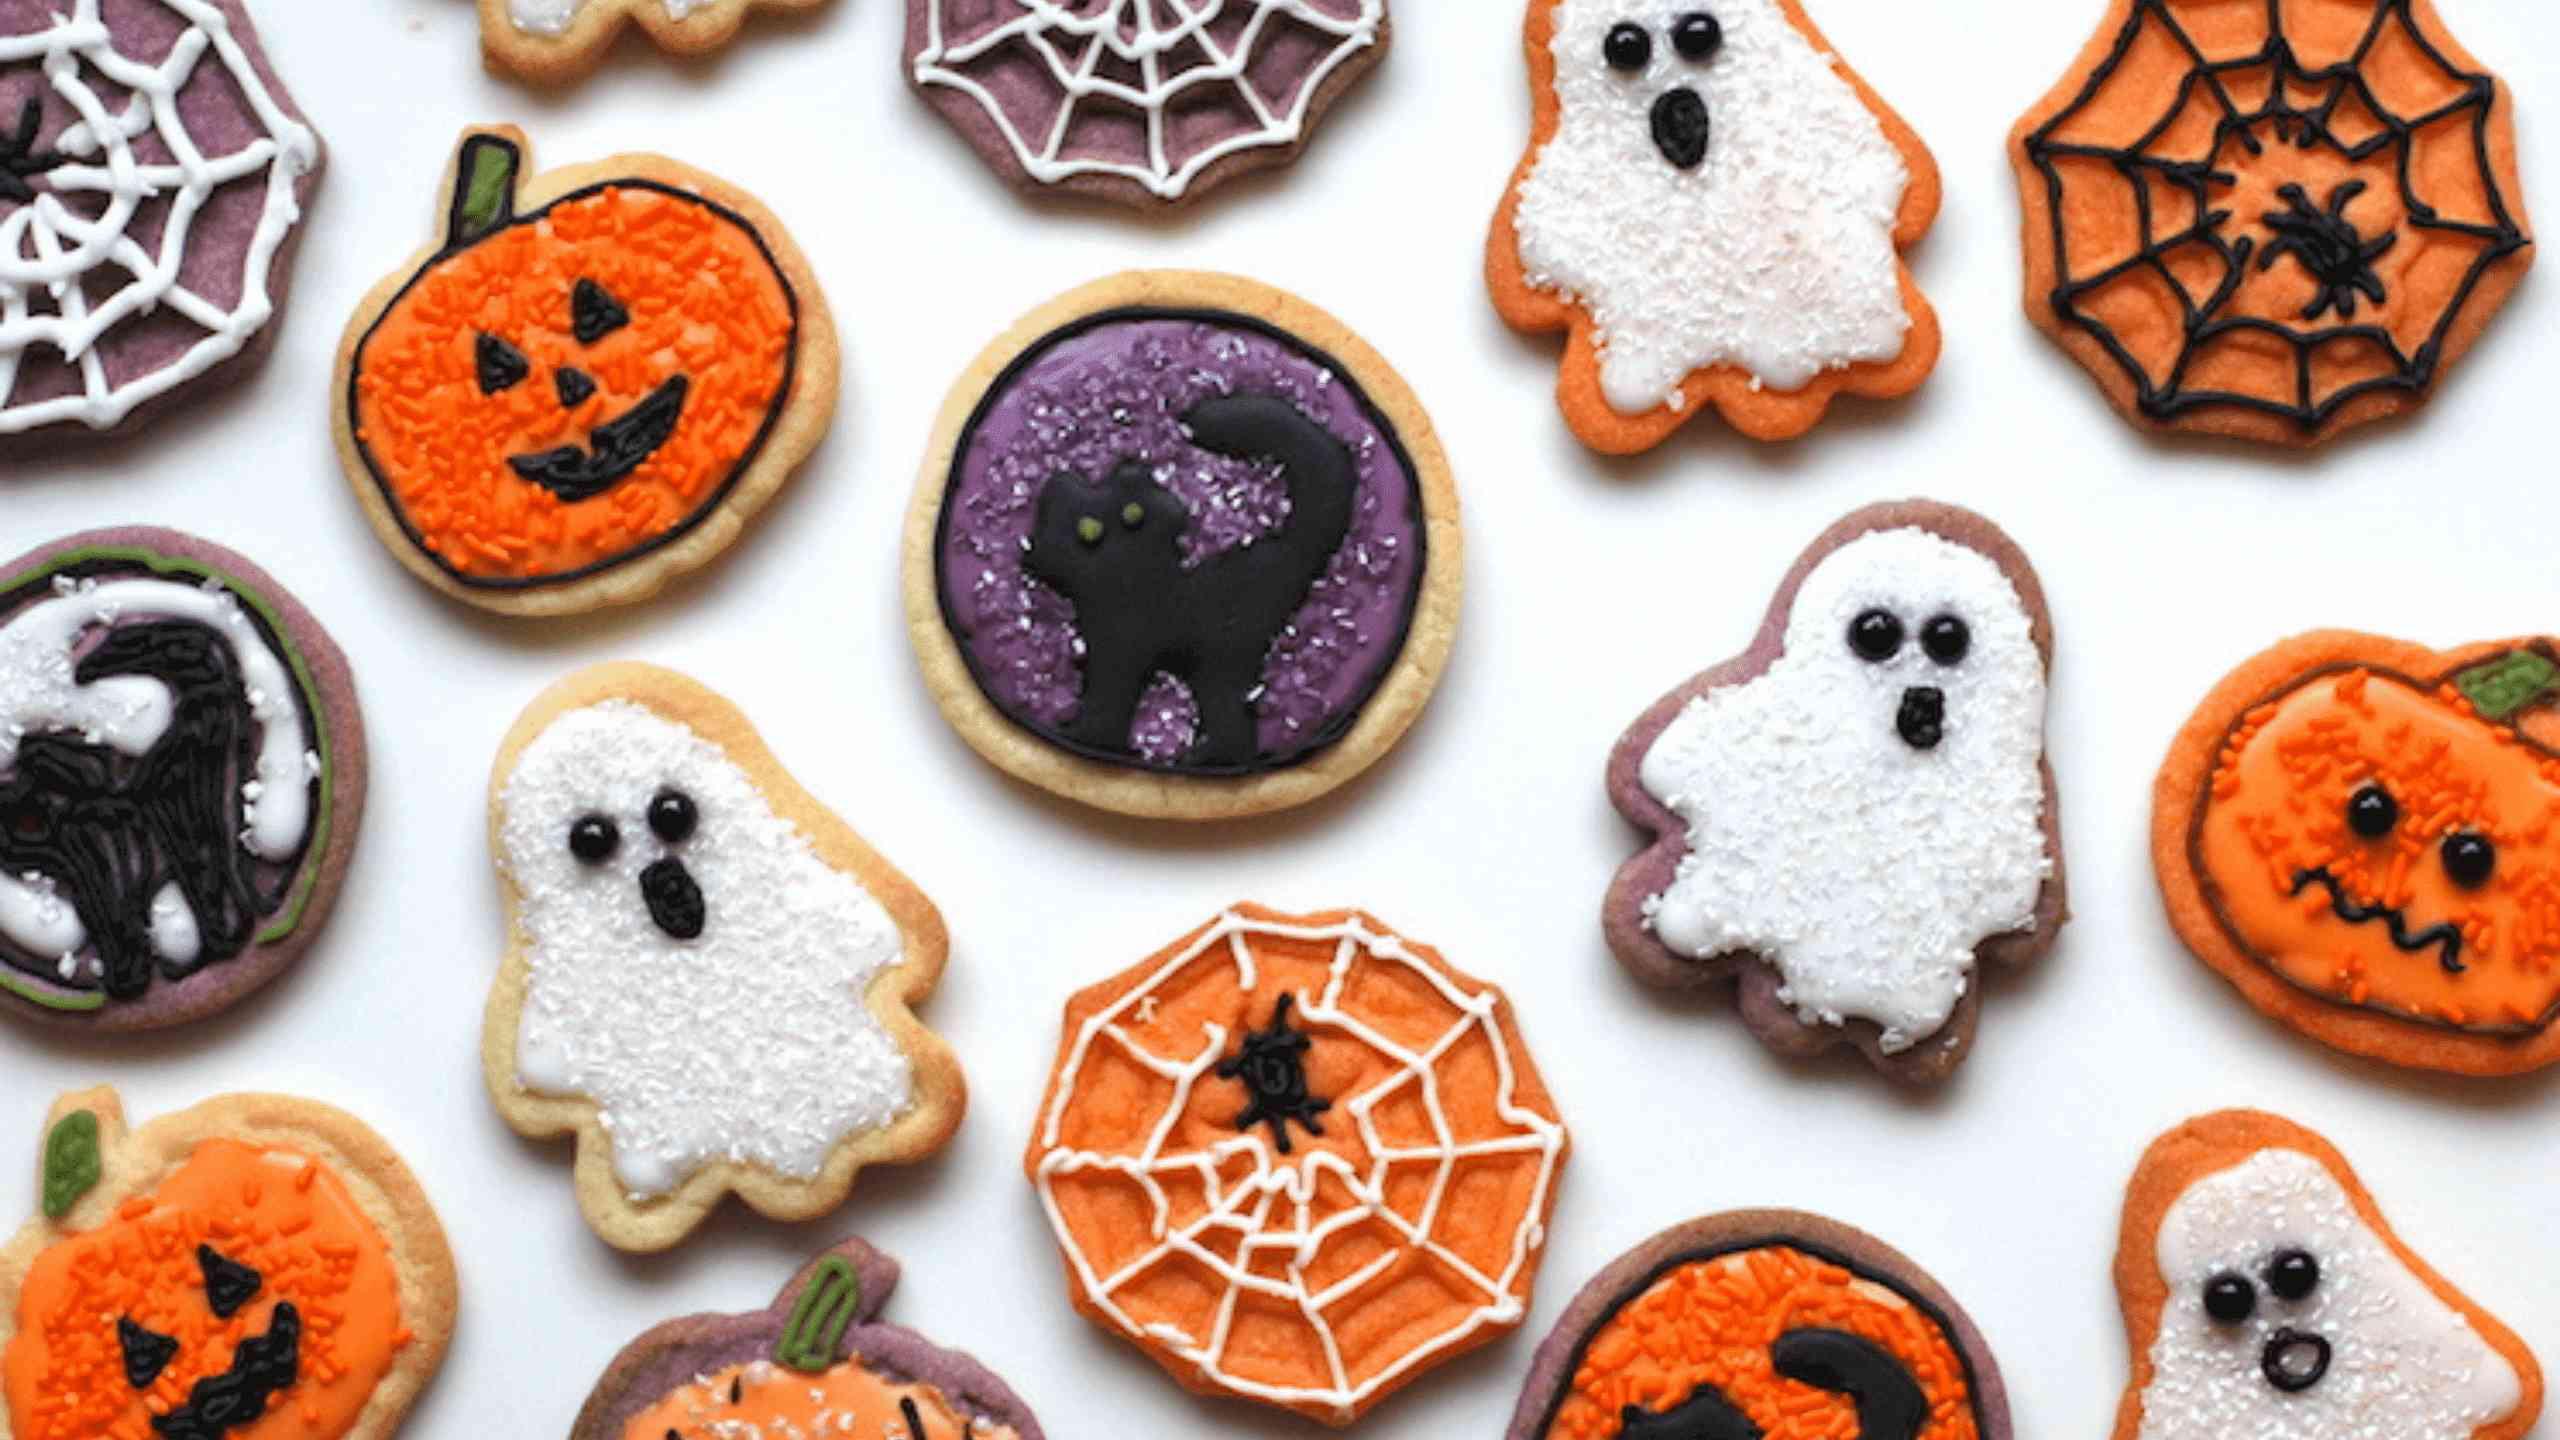 Recetas de Halloween para niños que debes probar ¡Escalofriantemente deliciosas!